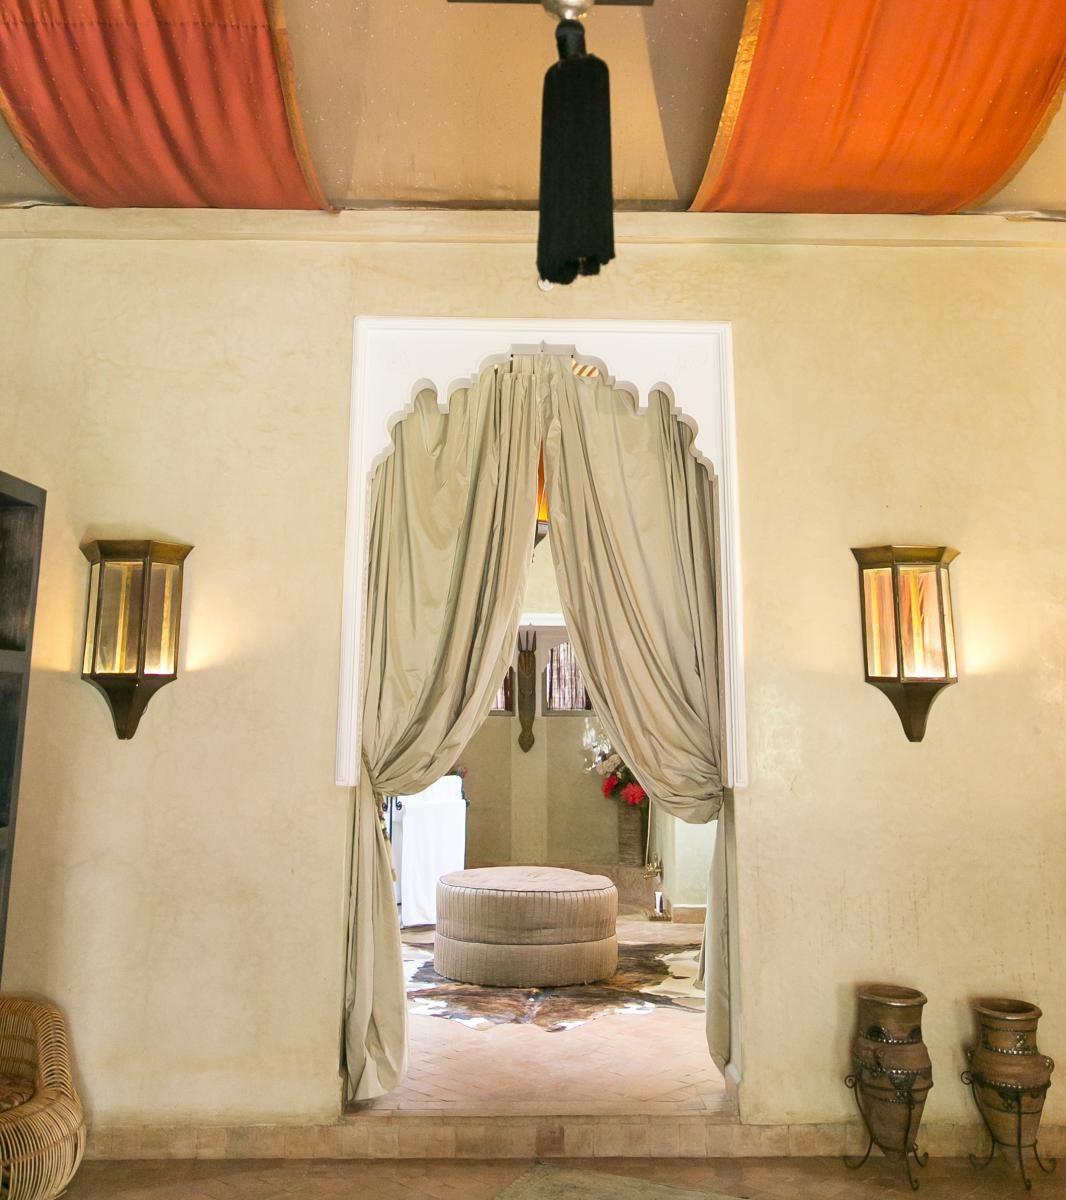 LodgeK Marrakech - Gallery Art - Déco lodge hotel